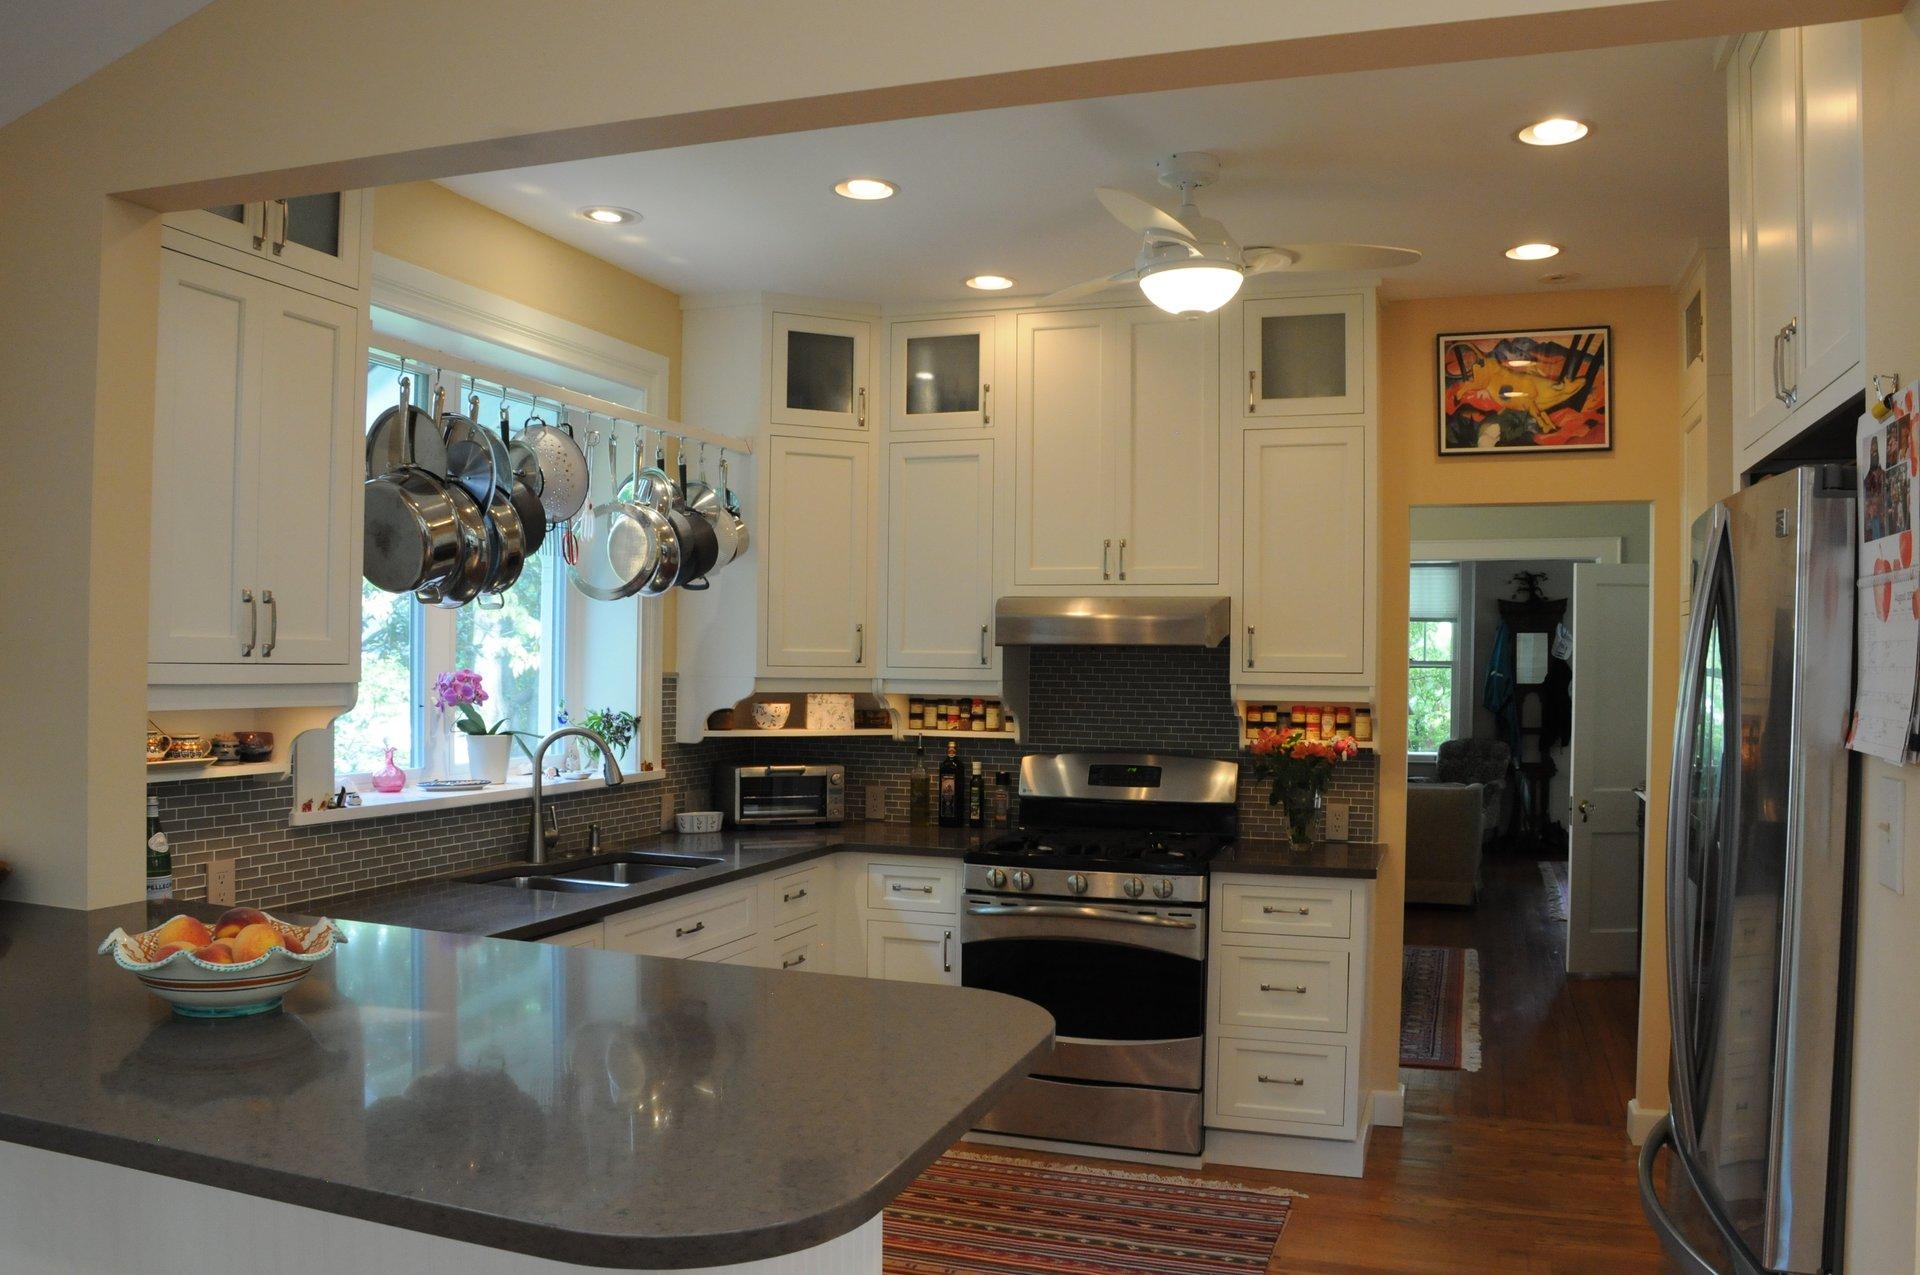 Terranova Construction Kitchen & Bath image 4